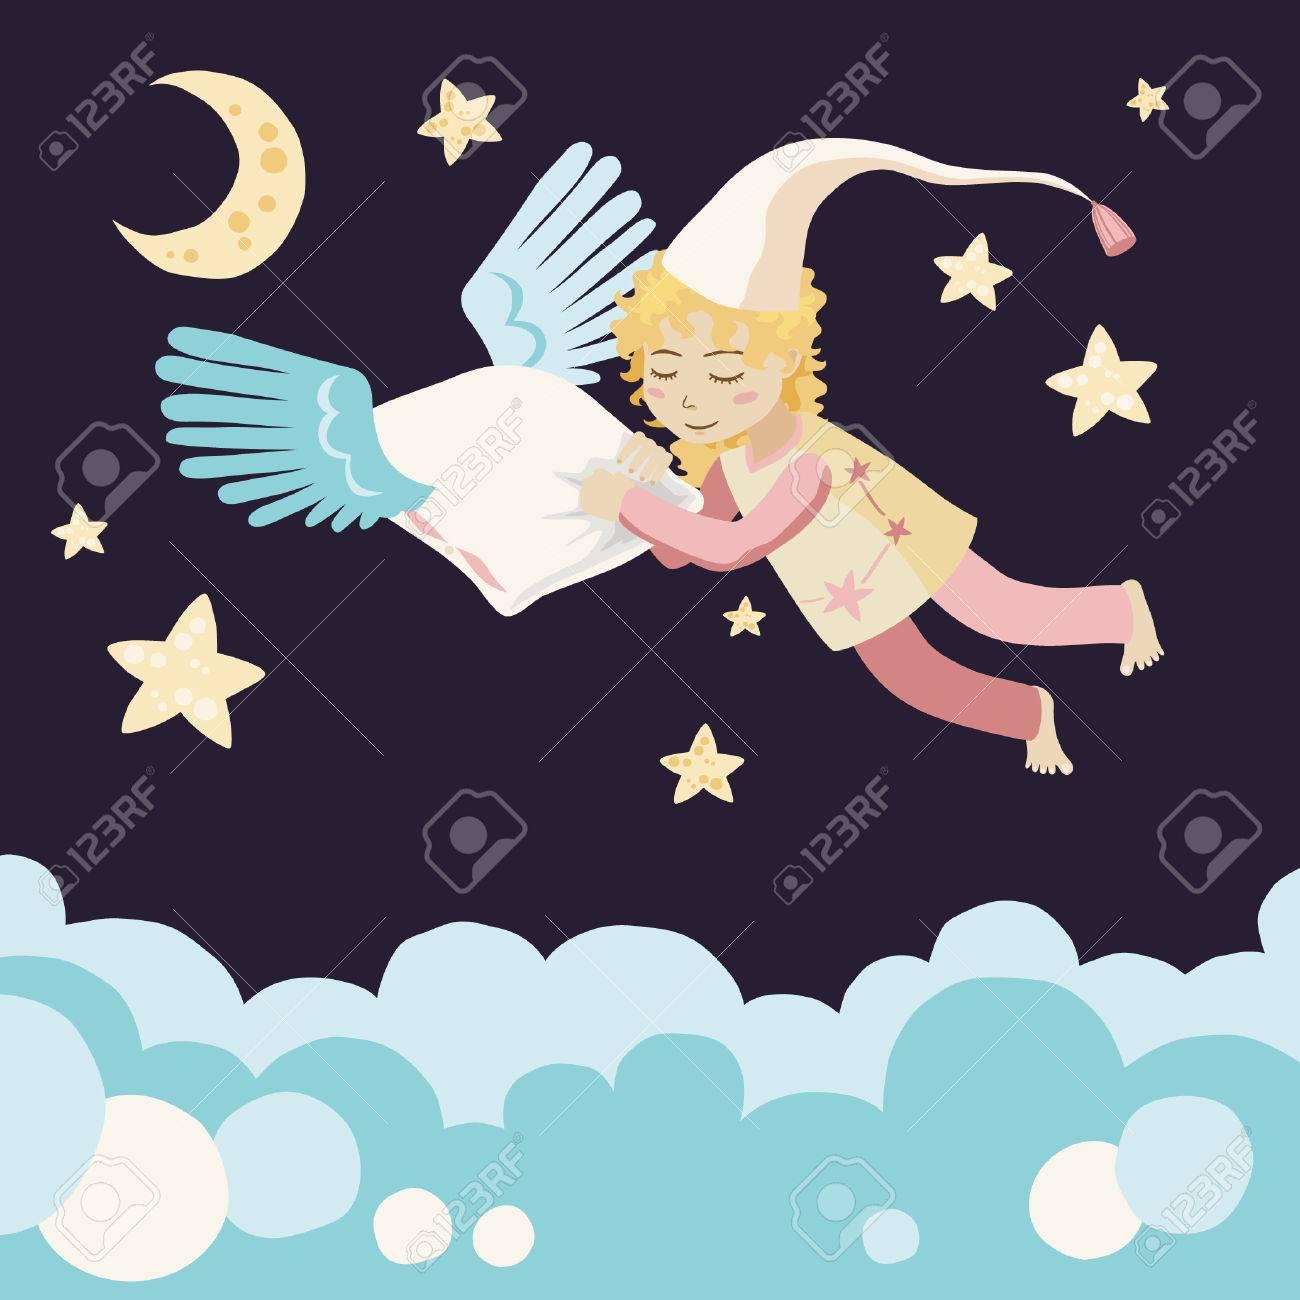 Sleeping Girl with Flying Pillow Stock Vector - 5540260